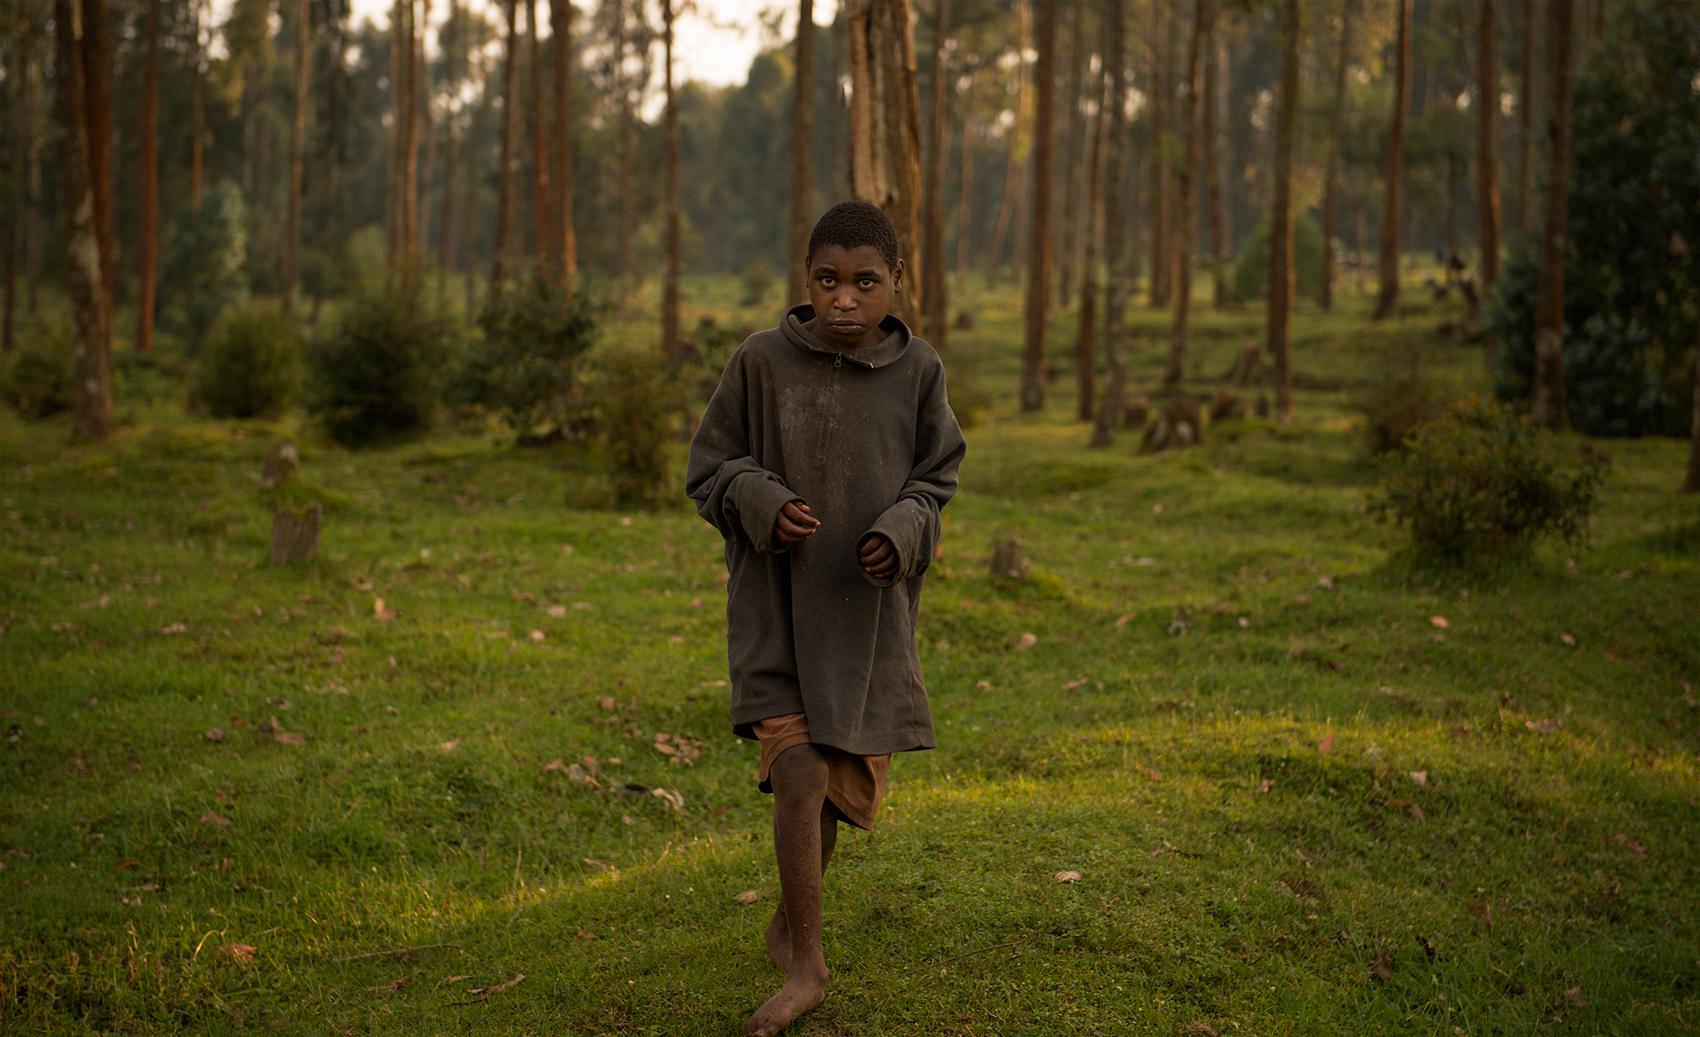 Boy at the edge of the woods, Rwanda